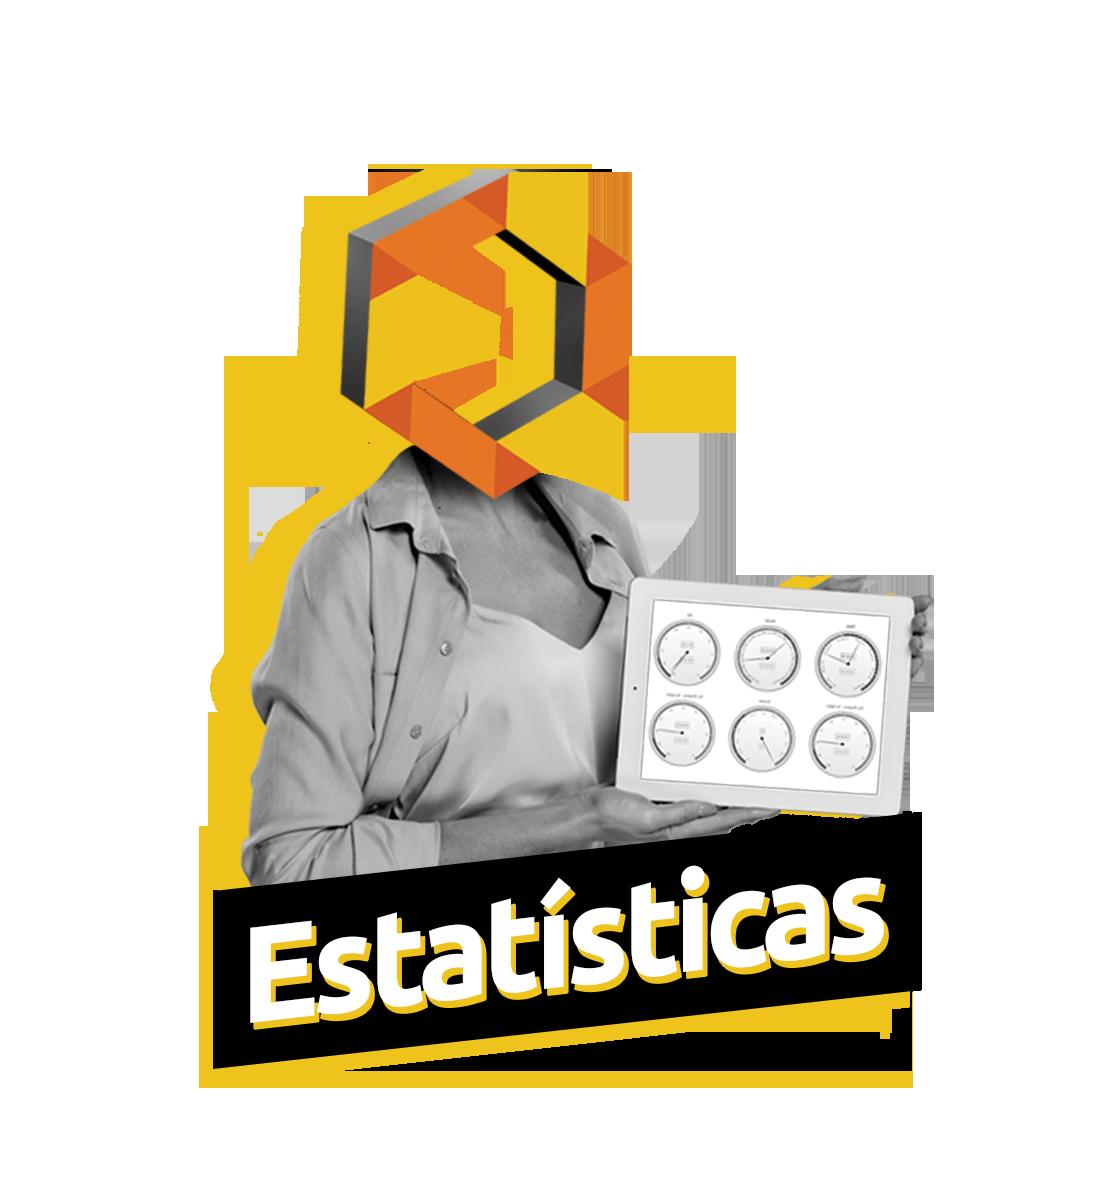 Módulo de Estatísticas do Beedoo